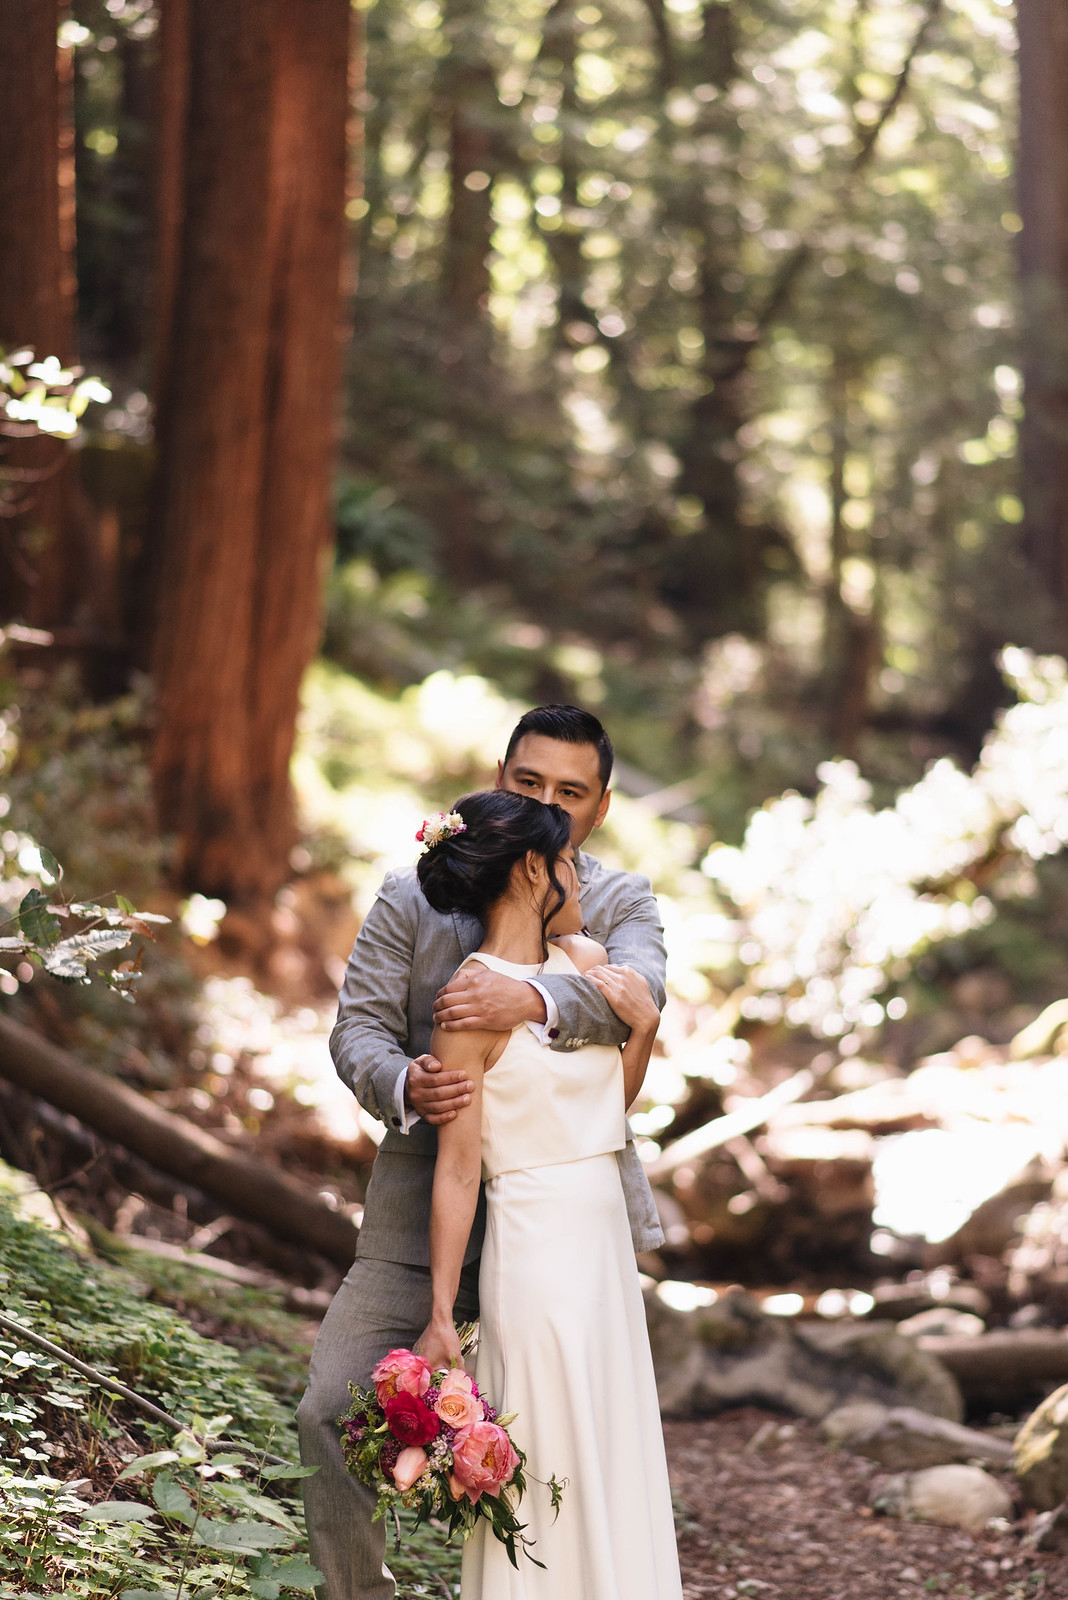 Megan Markle Inspired Wedding Dress on juliettelaura.com